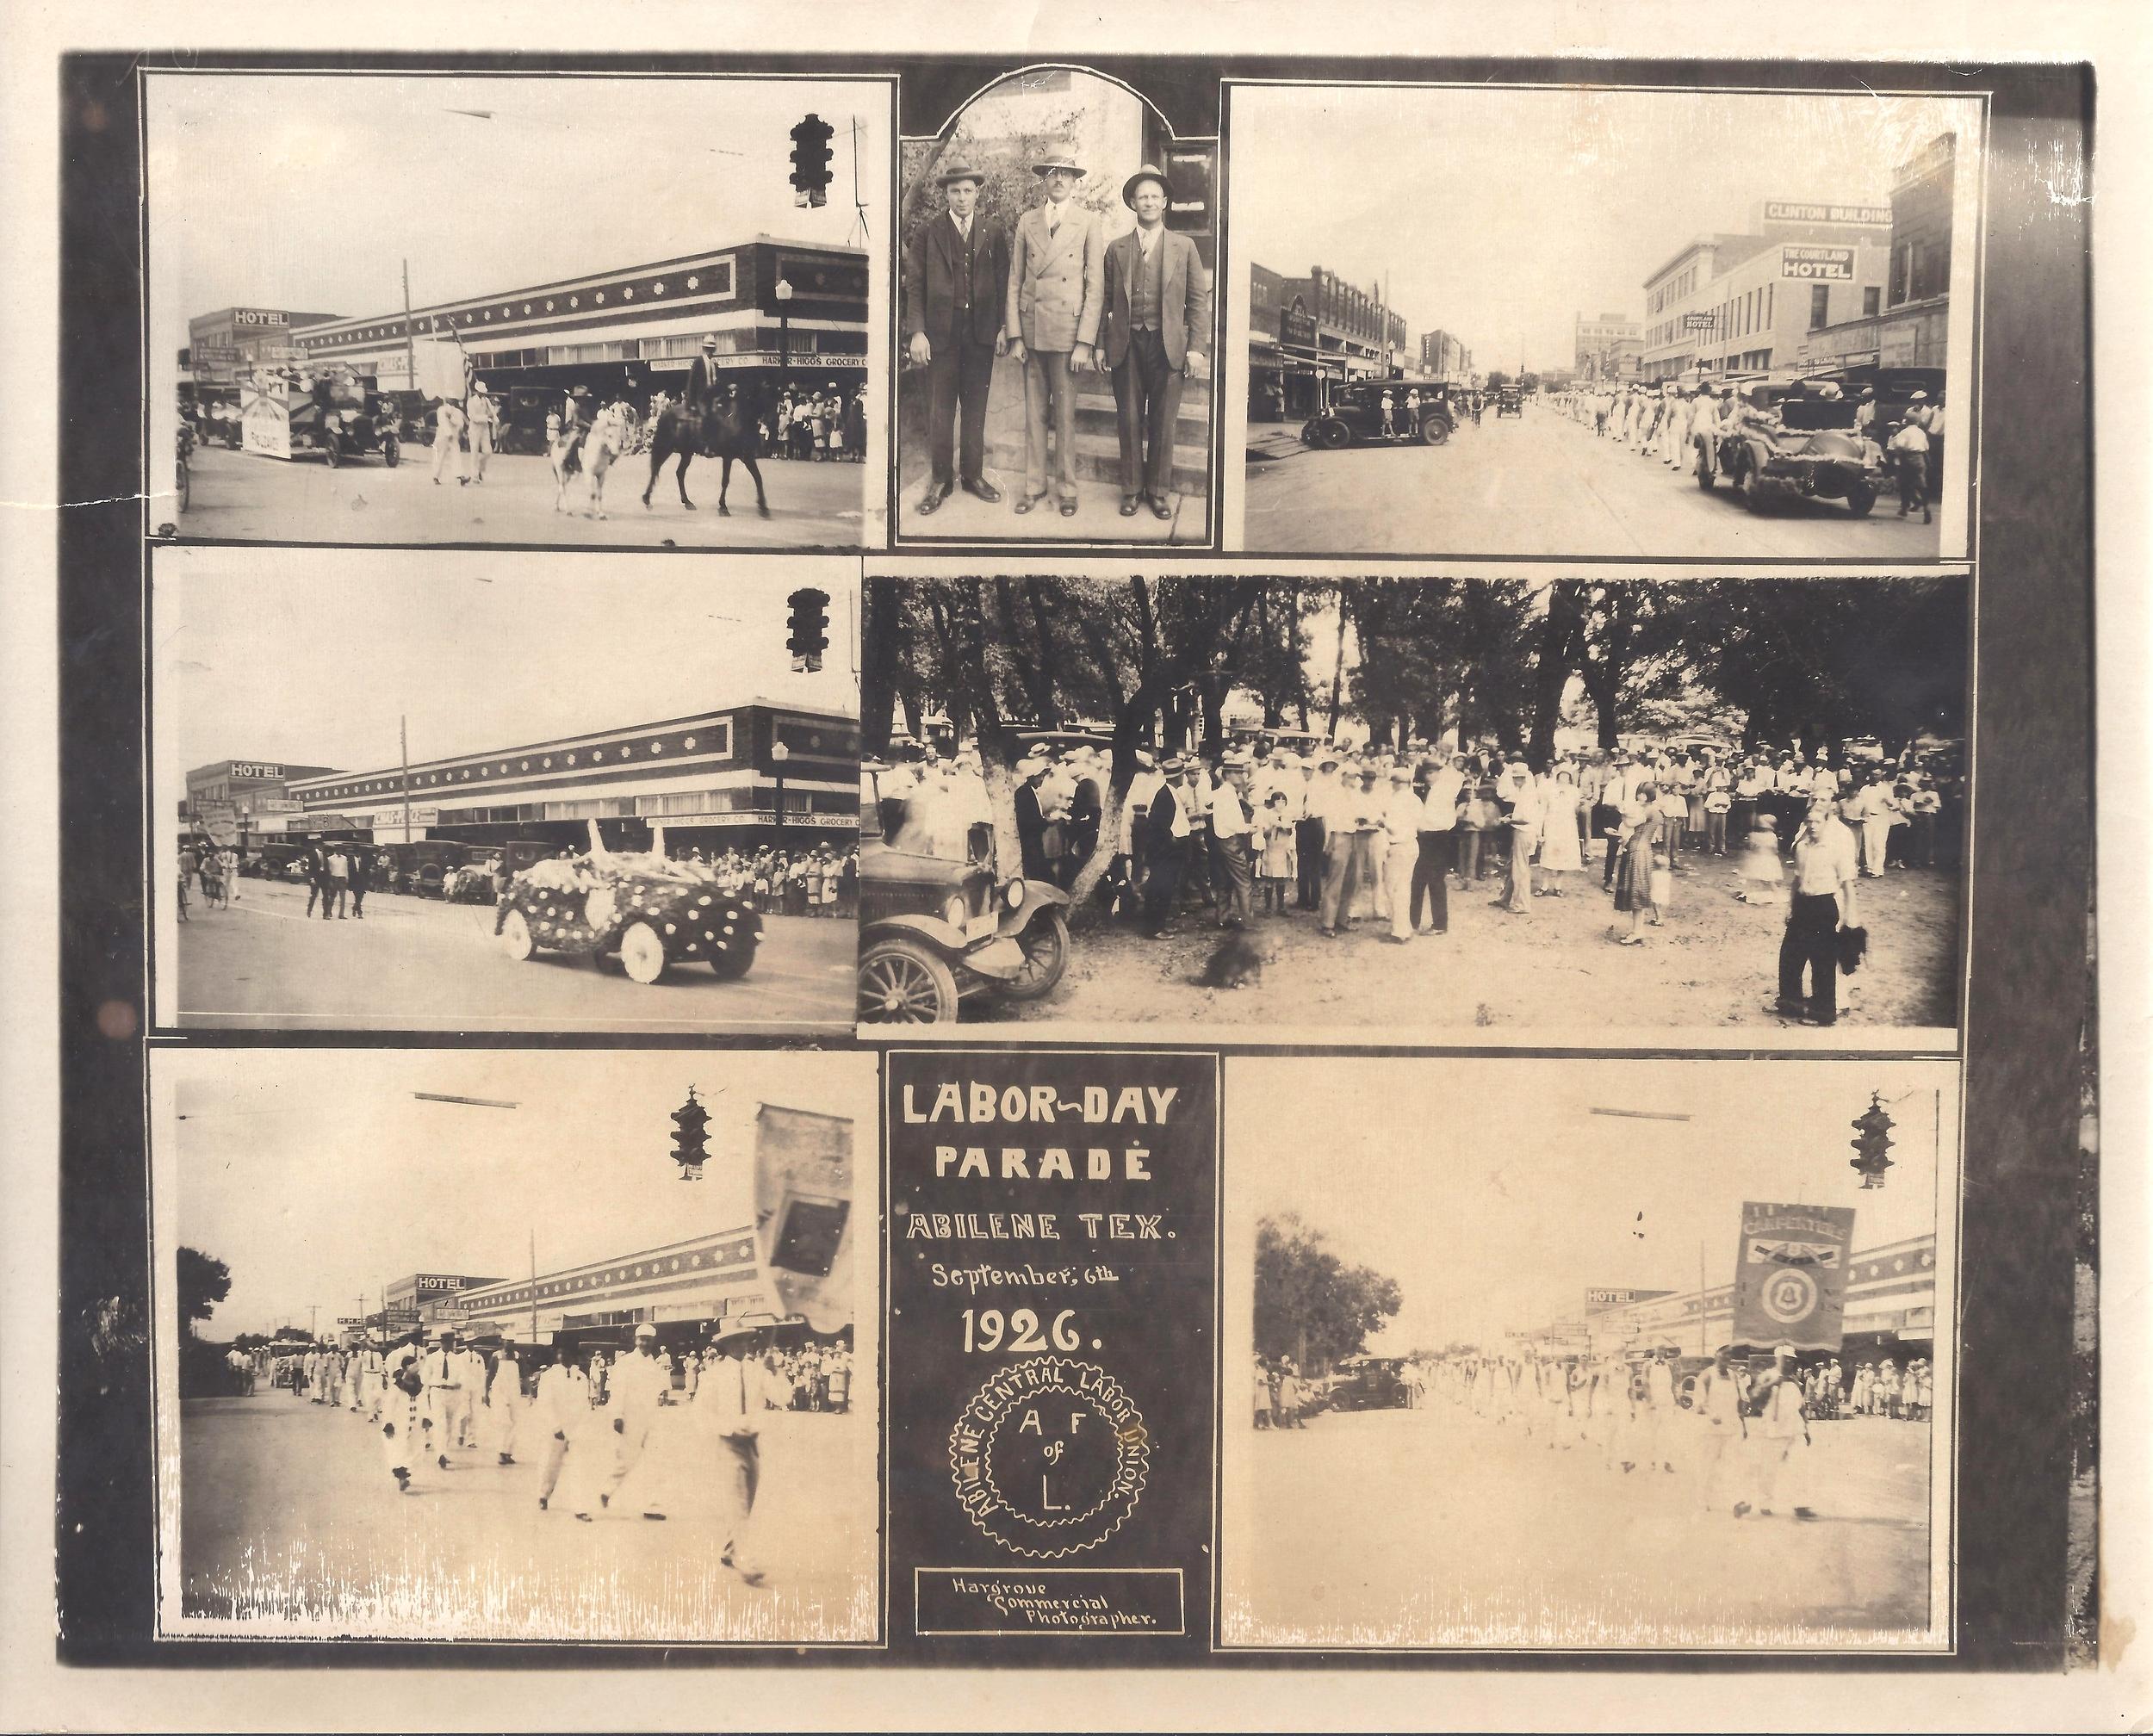 1994_037_0001 - Print, Photographic, Labor Day Parade.jpg